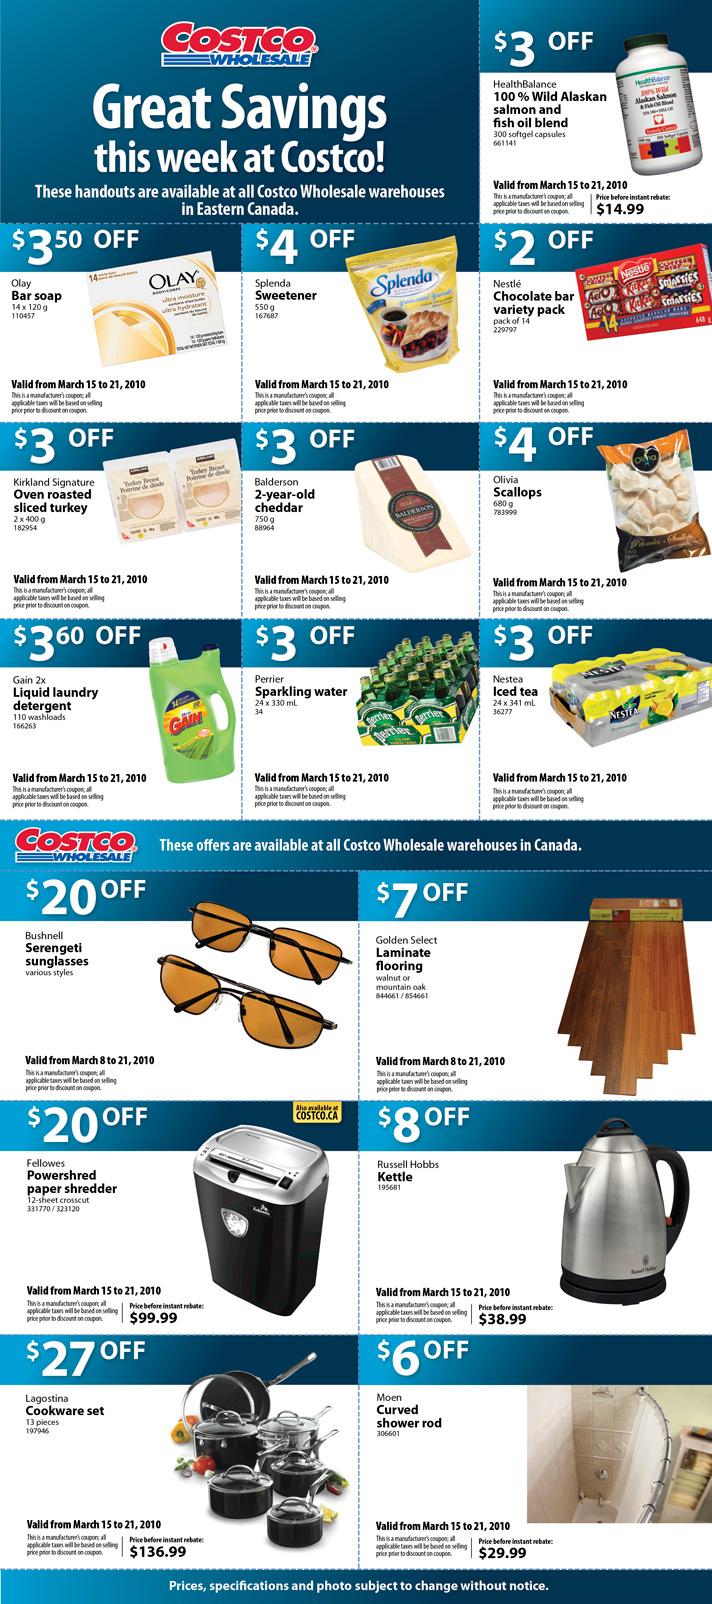 Costco photo coupon promo code